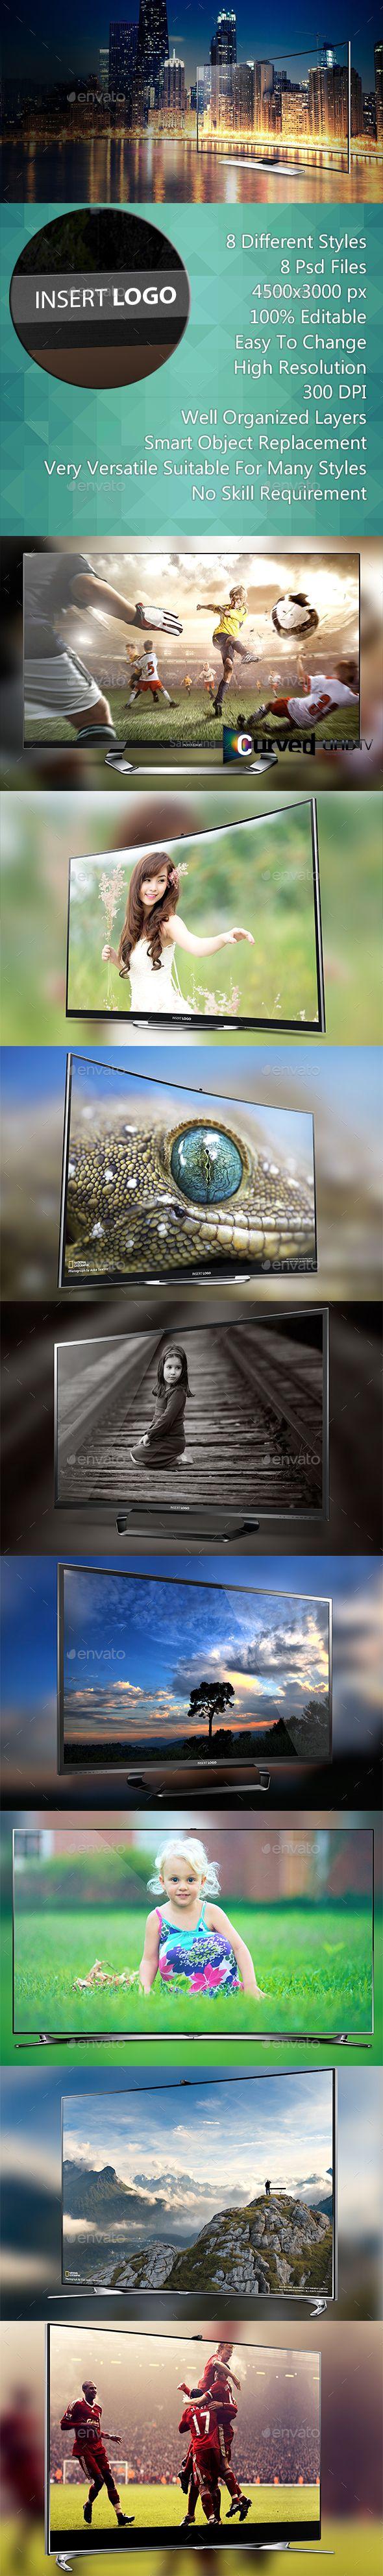 Smart Screen Mockup - UHD TV